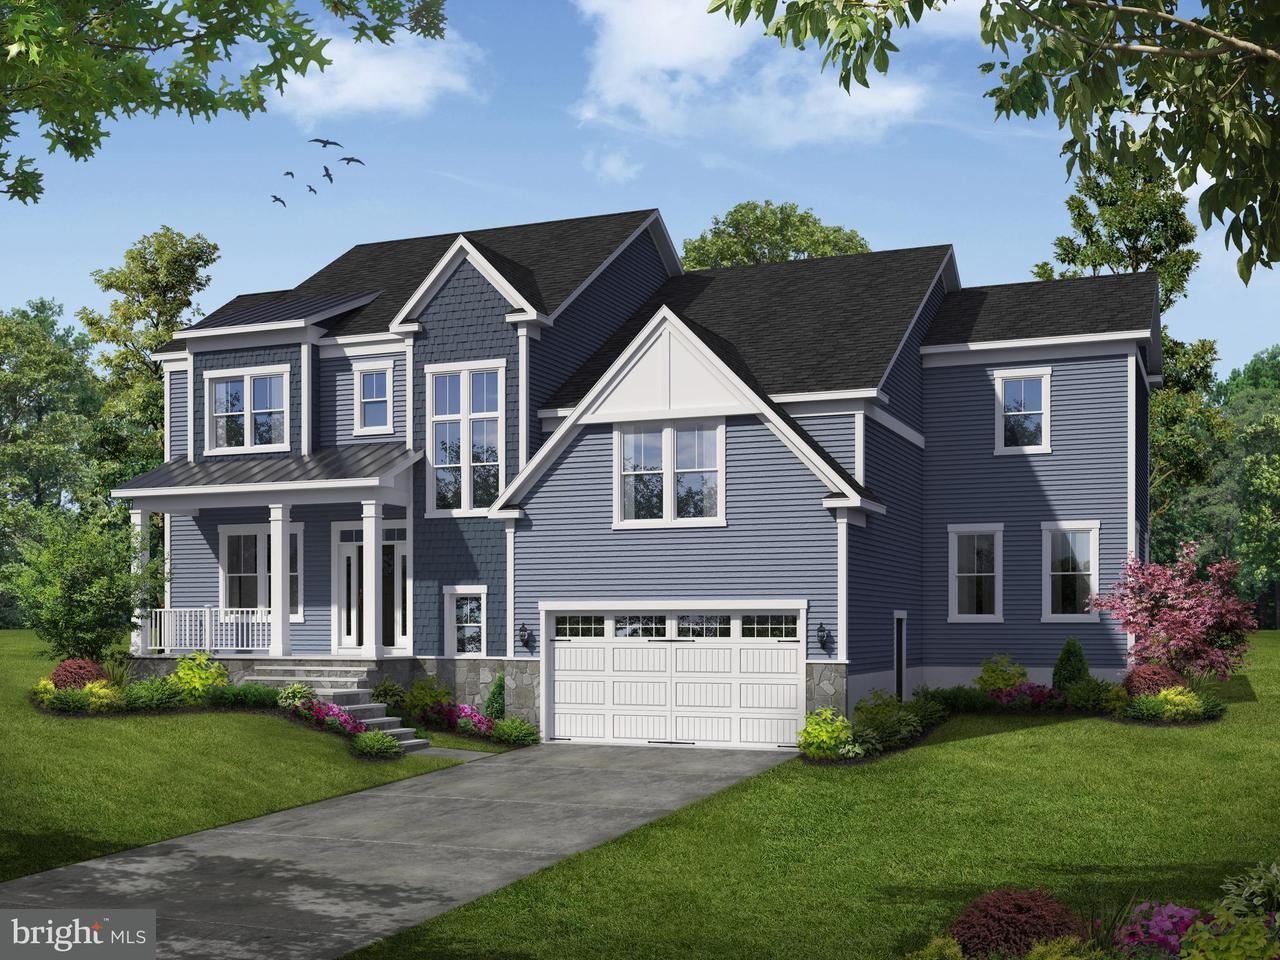 Single Family Home for Sale at 3518 Ottawa Street 3518 Ottawa Street Arlington, Virginia 22213 United States